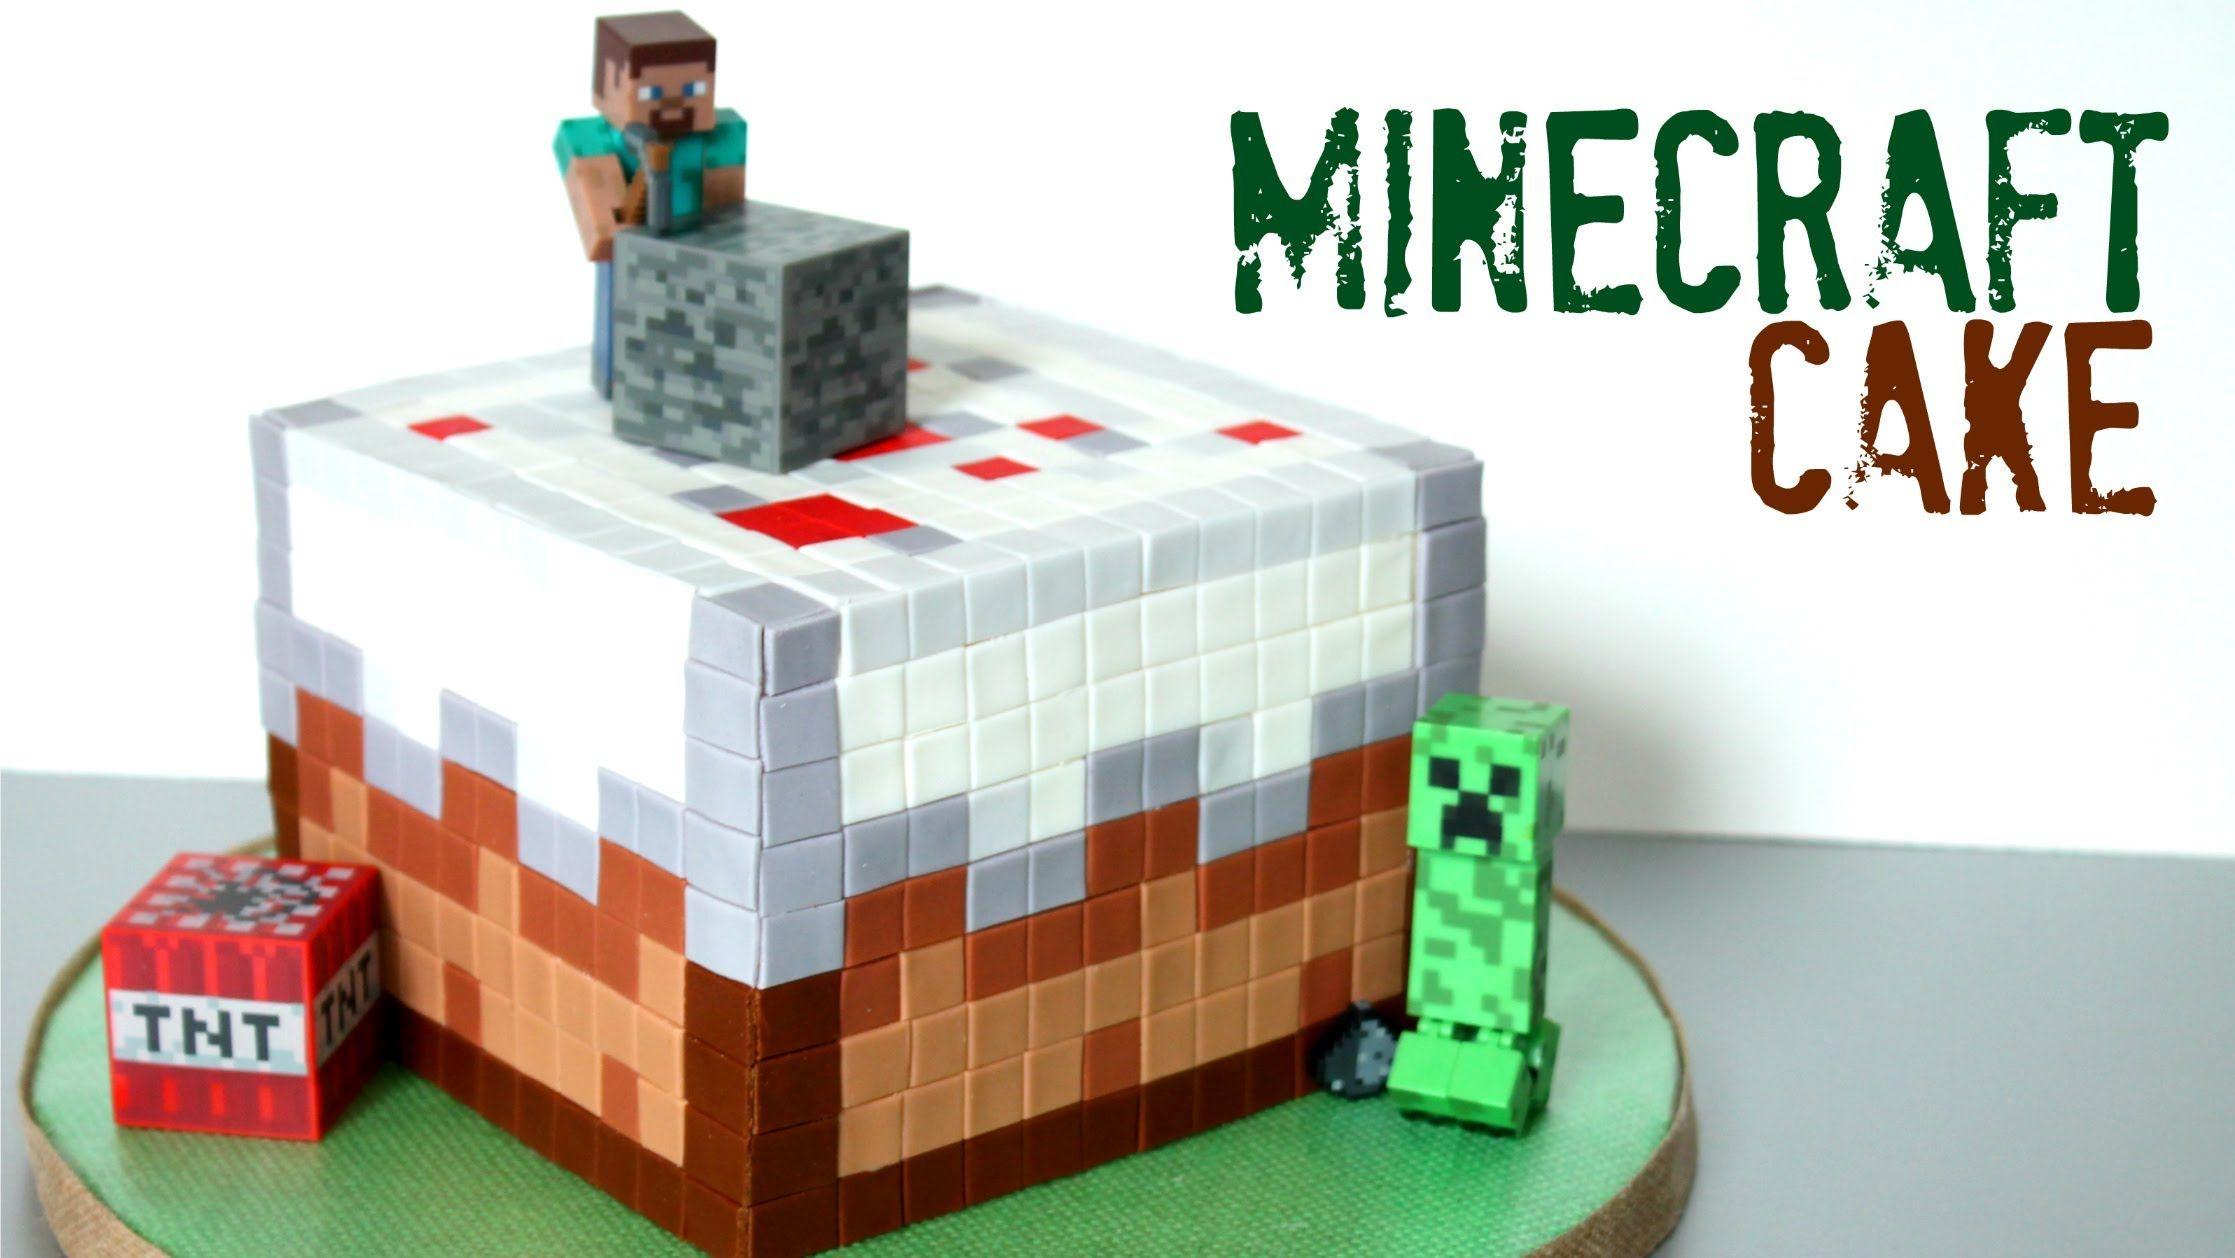 Pin by Jonathen Wilks on Redstone stuff Minecraft